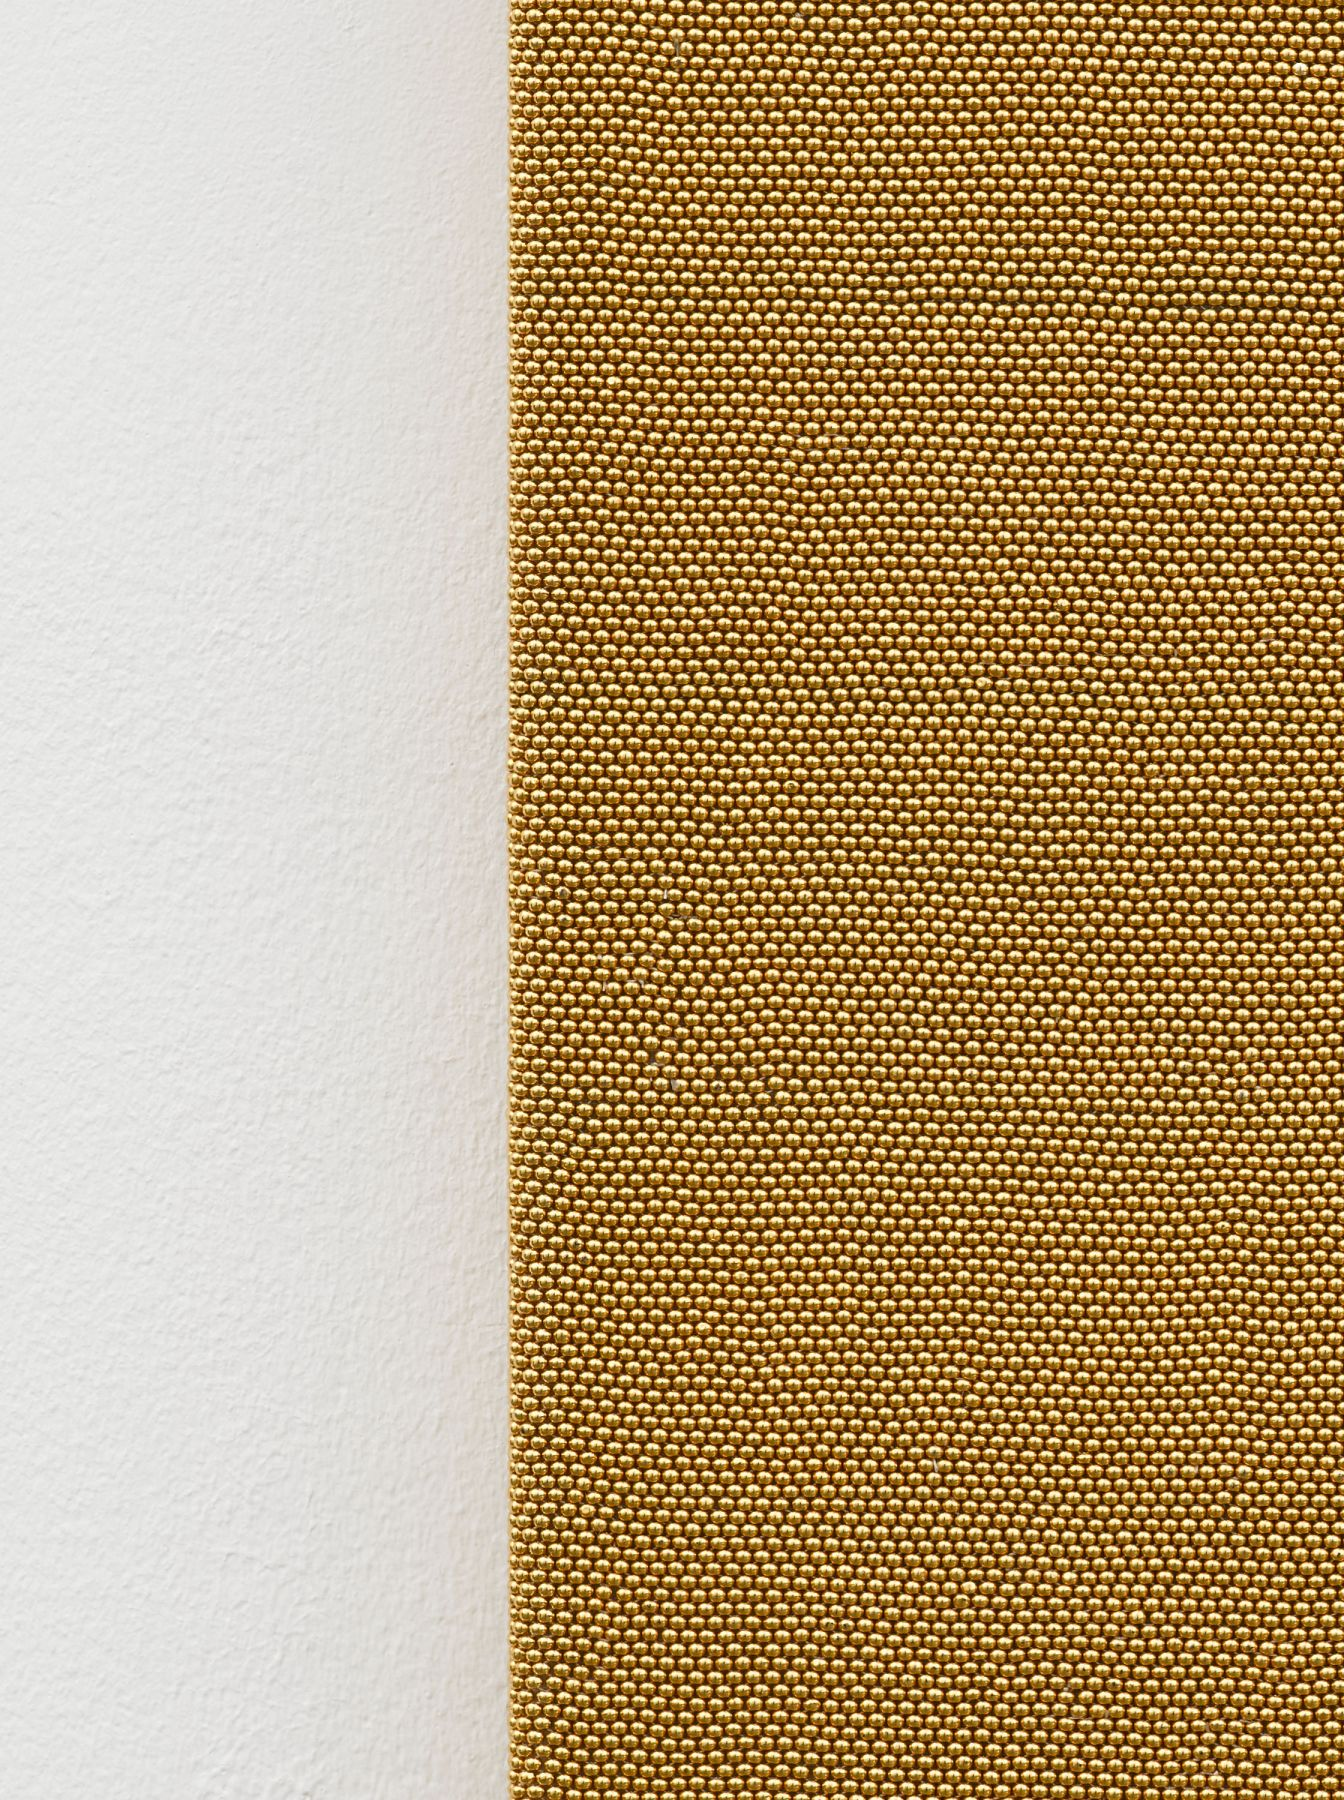 LIZA LOU Midas / Solid(detail),2012-14